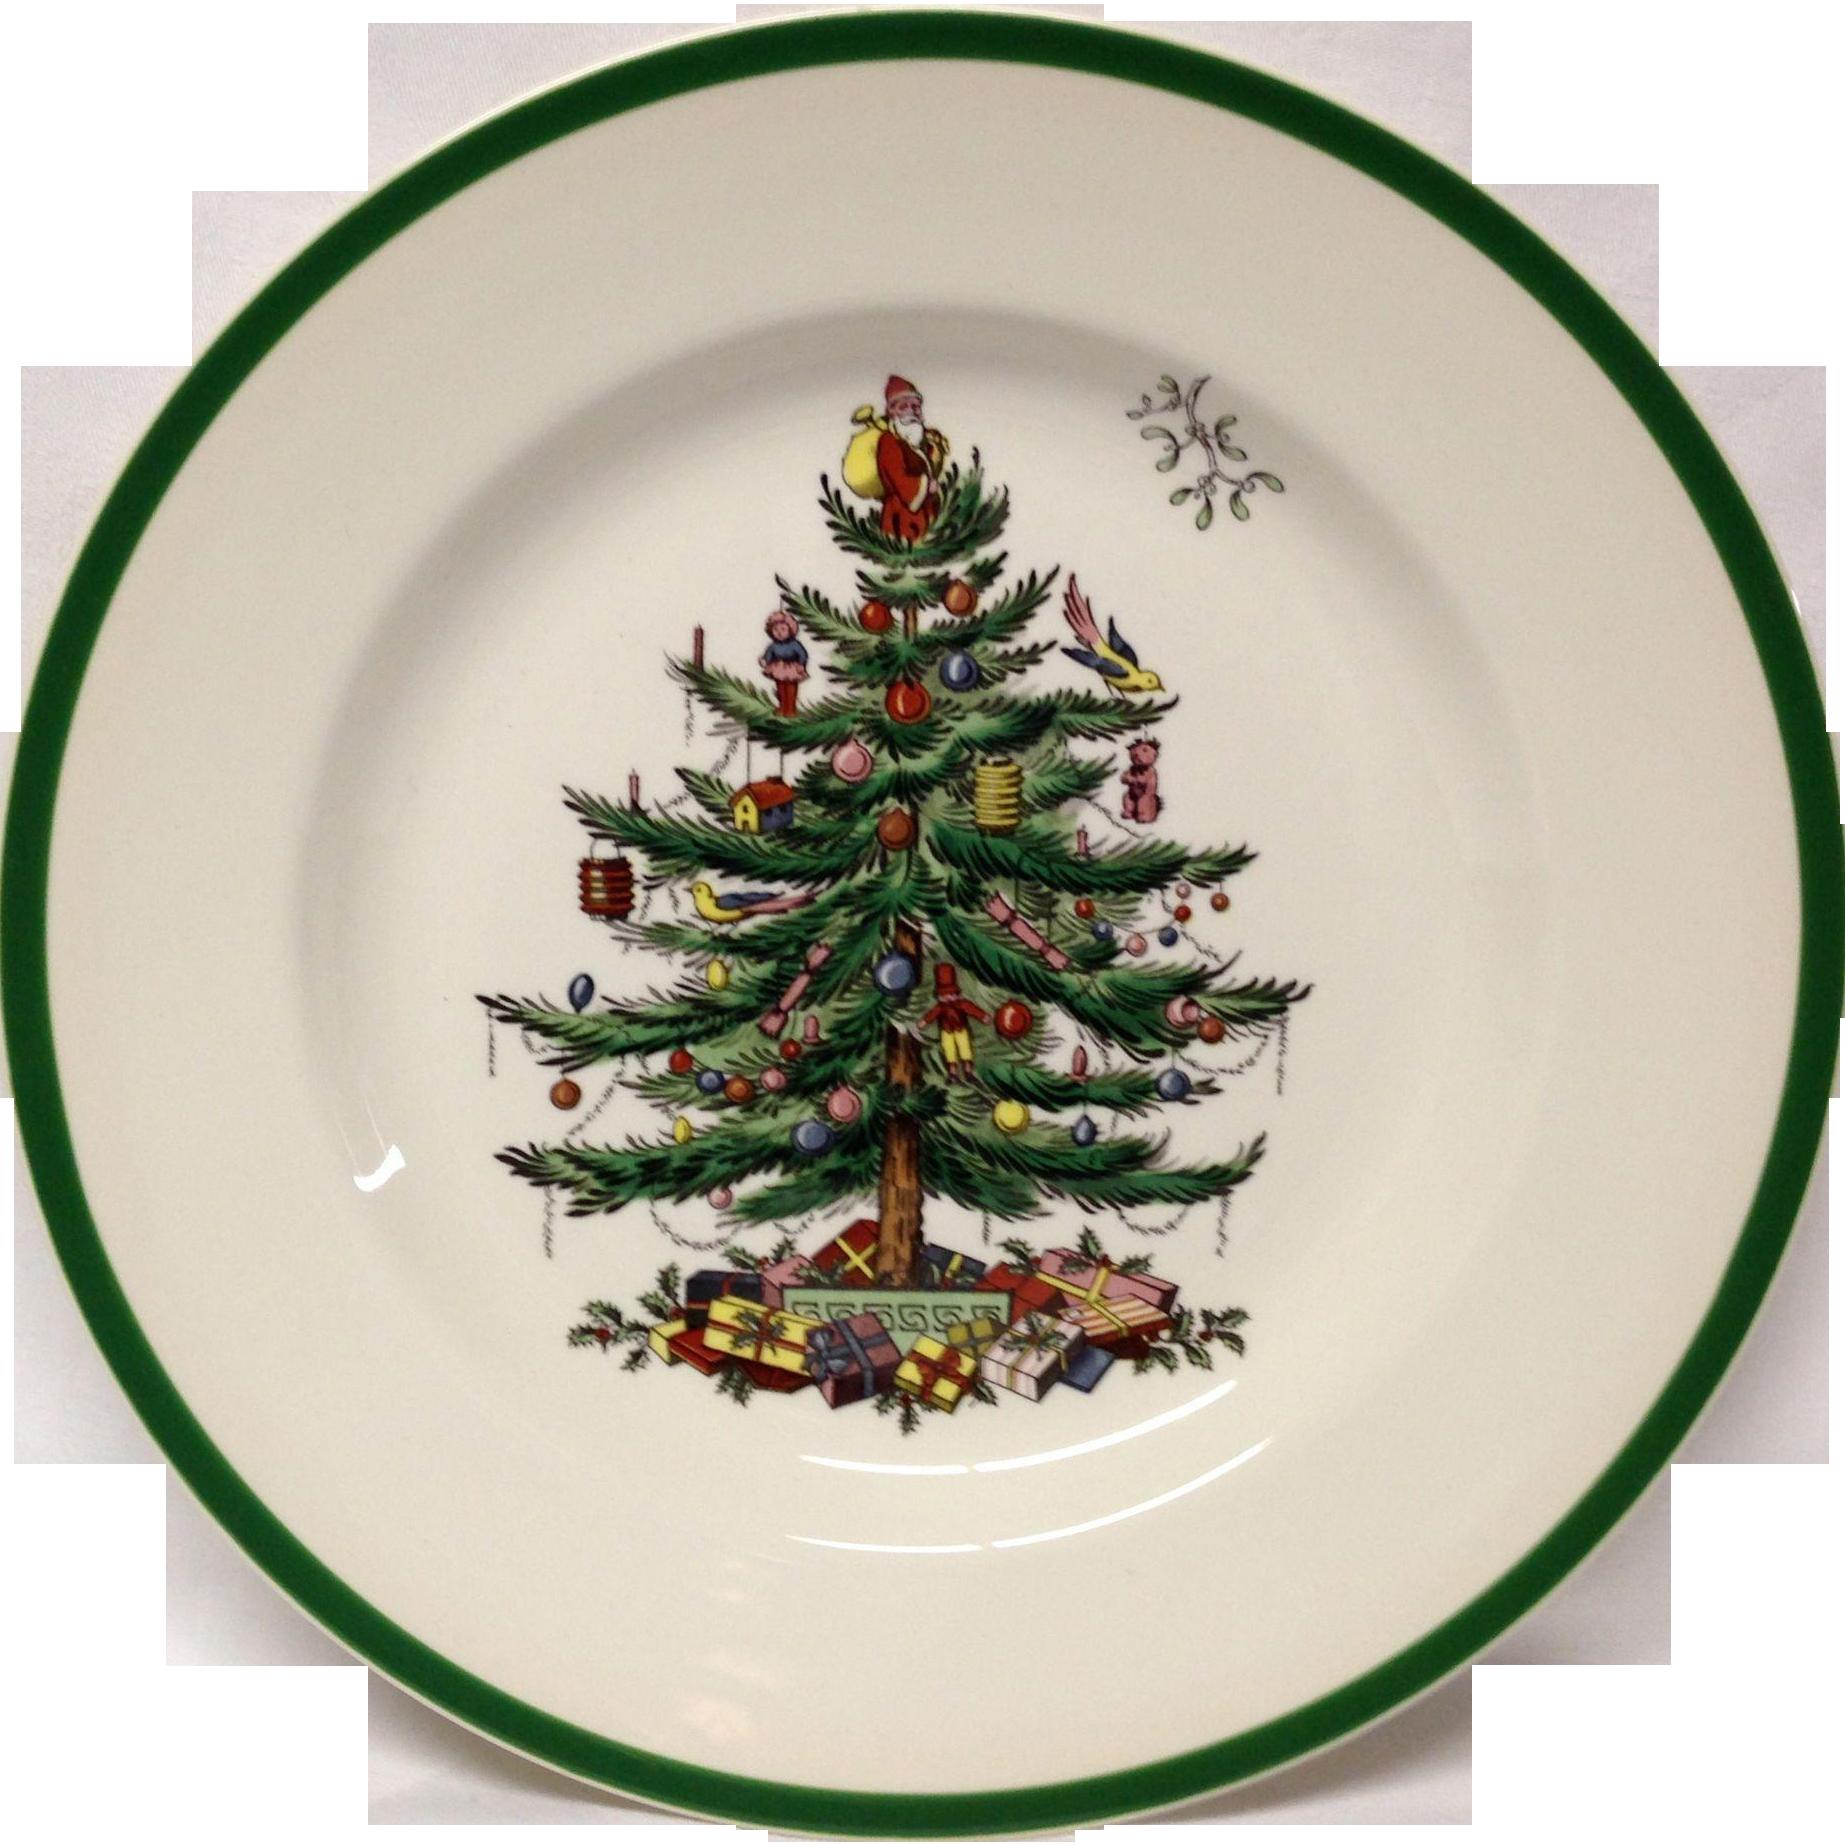 Spode Christmas Tree Dinner Plate, England